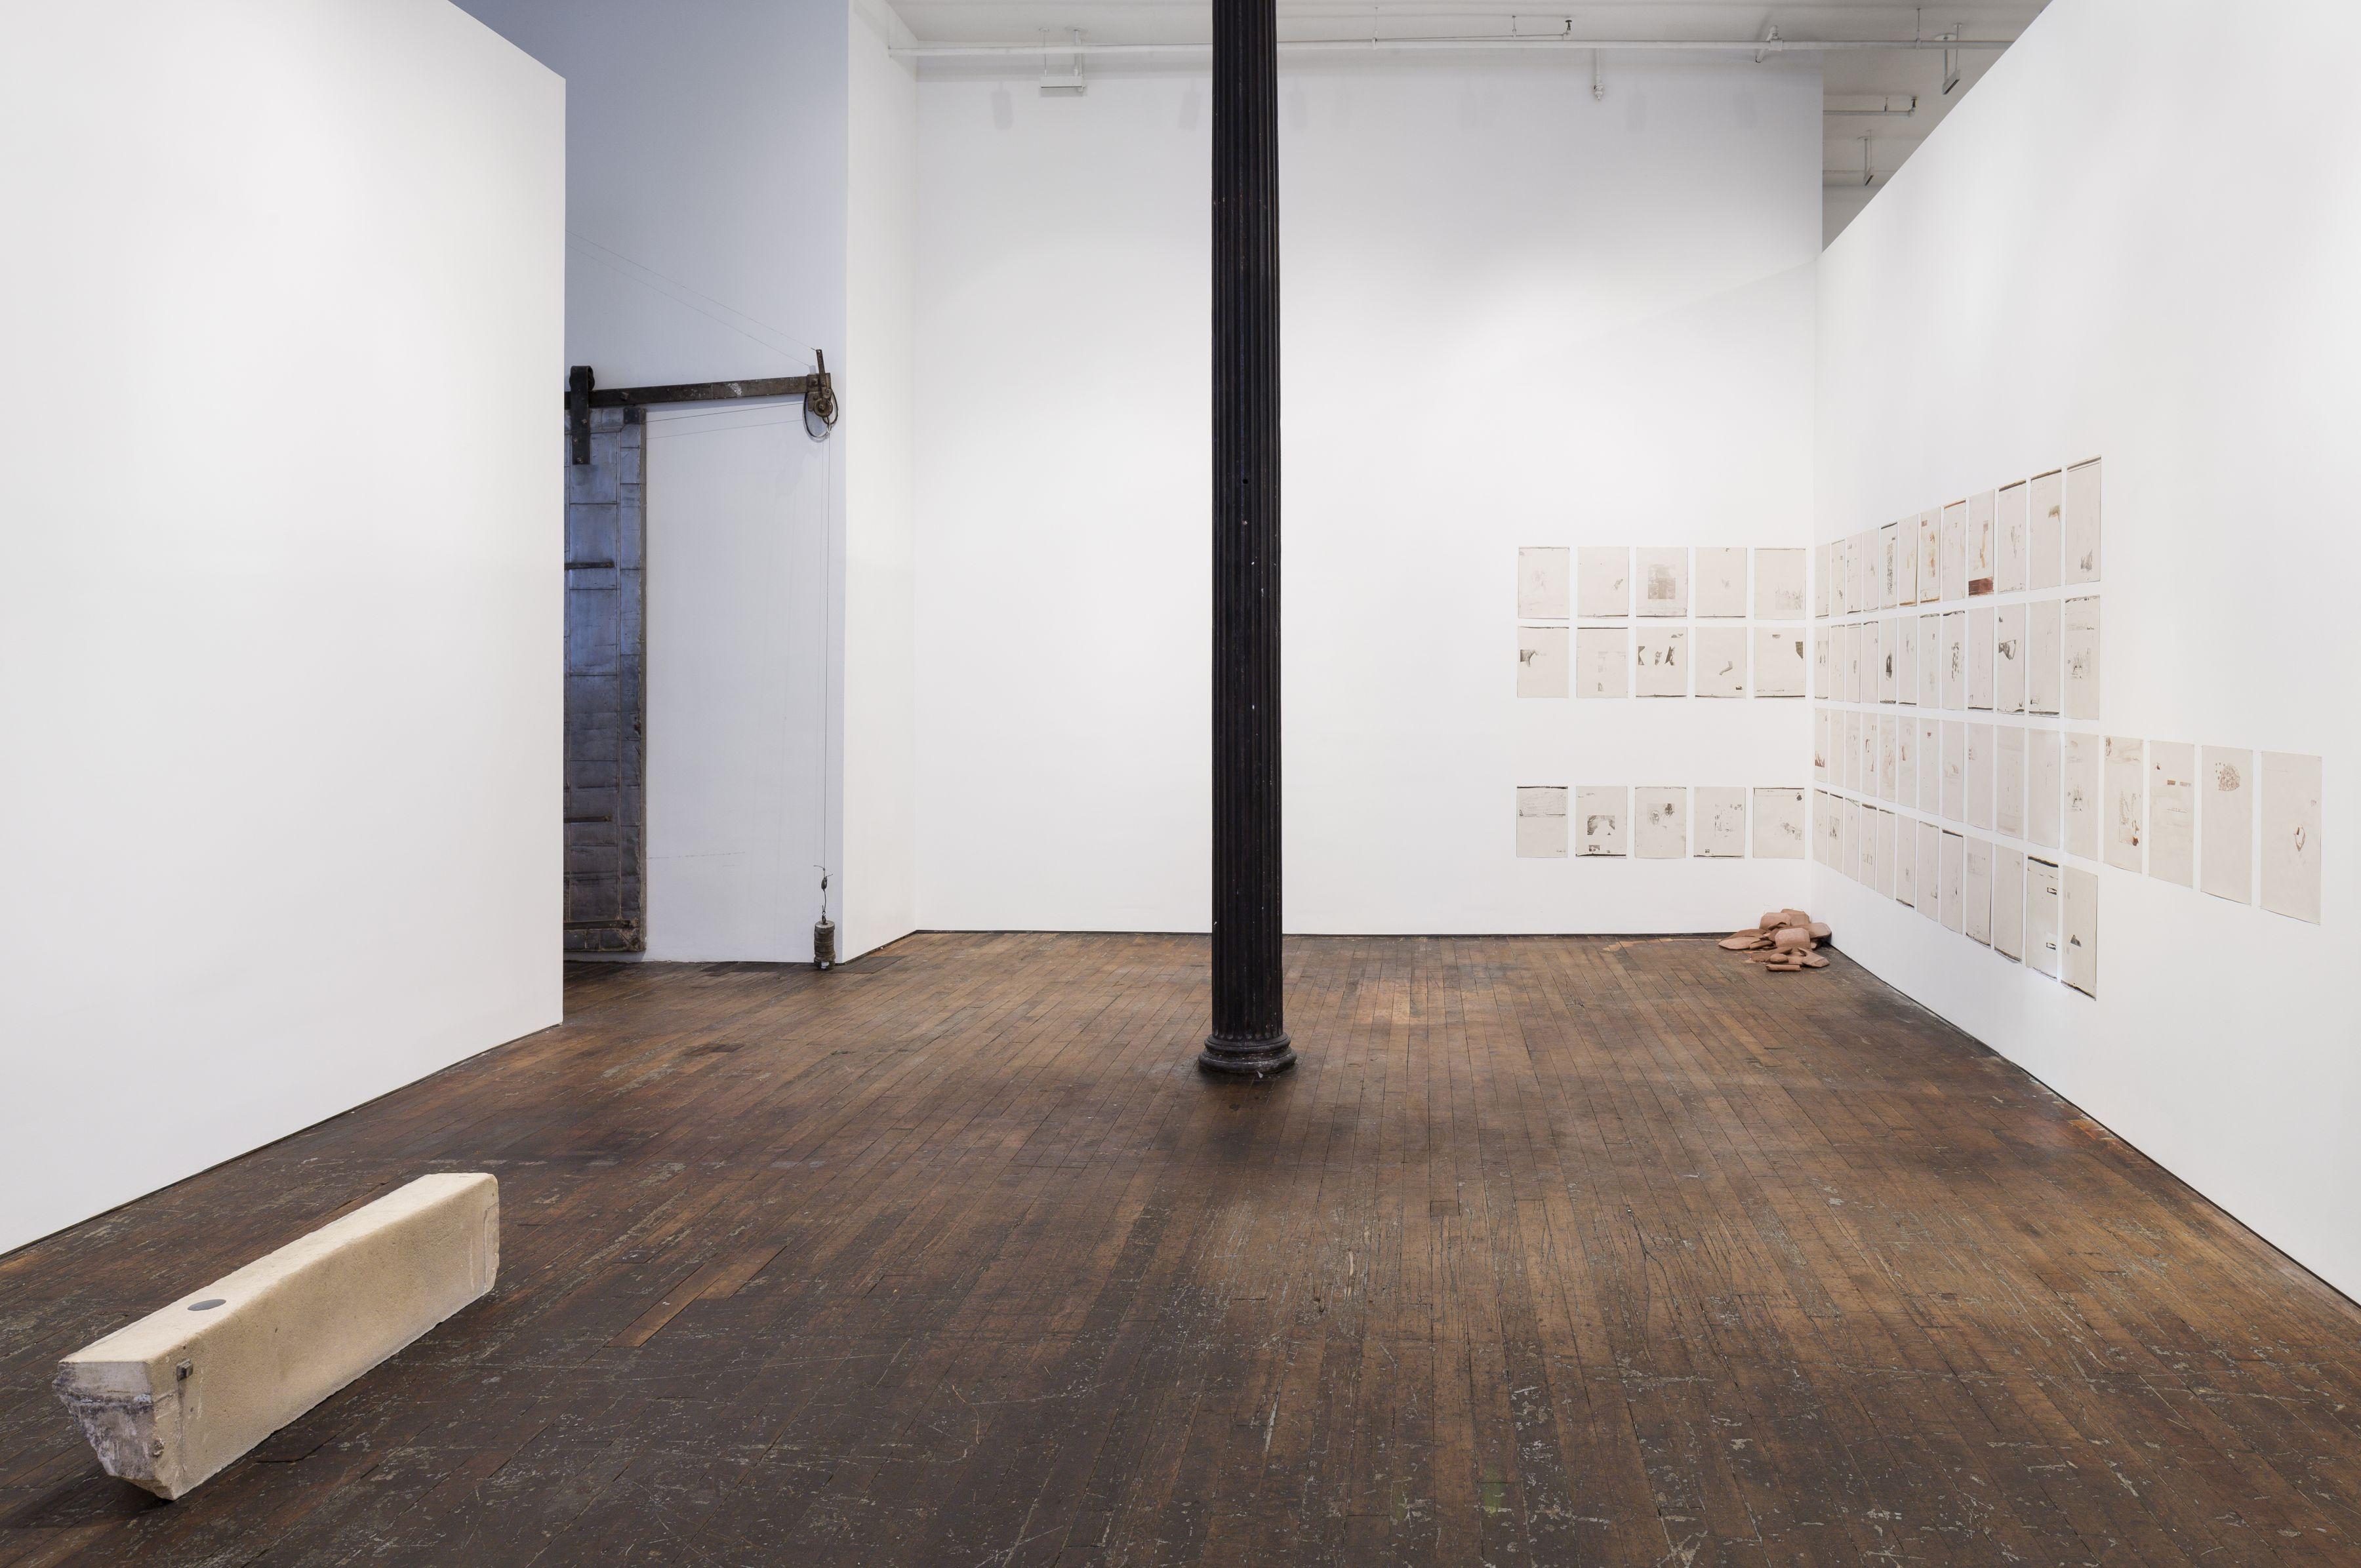 Lucy Skaer: Random House– installation view 2